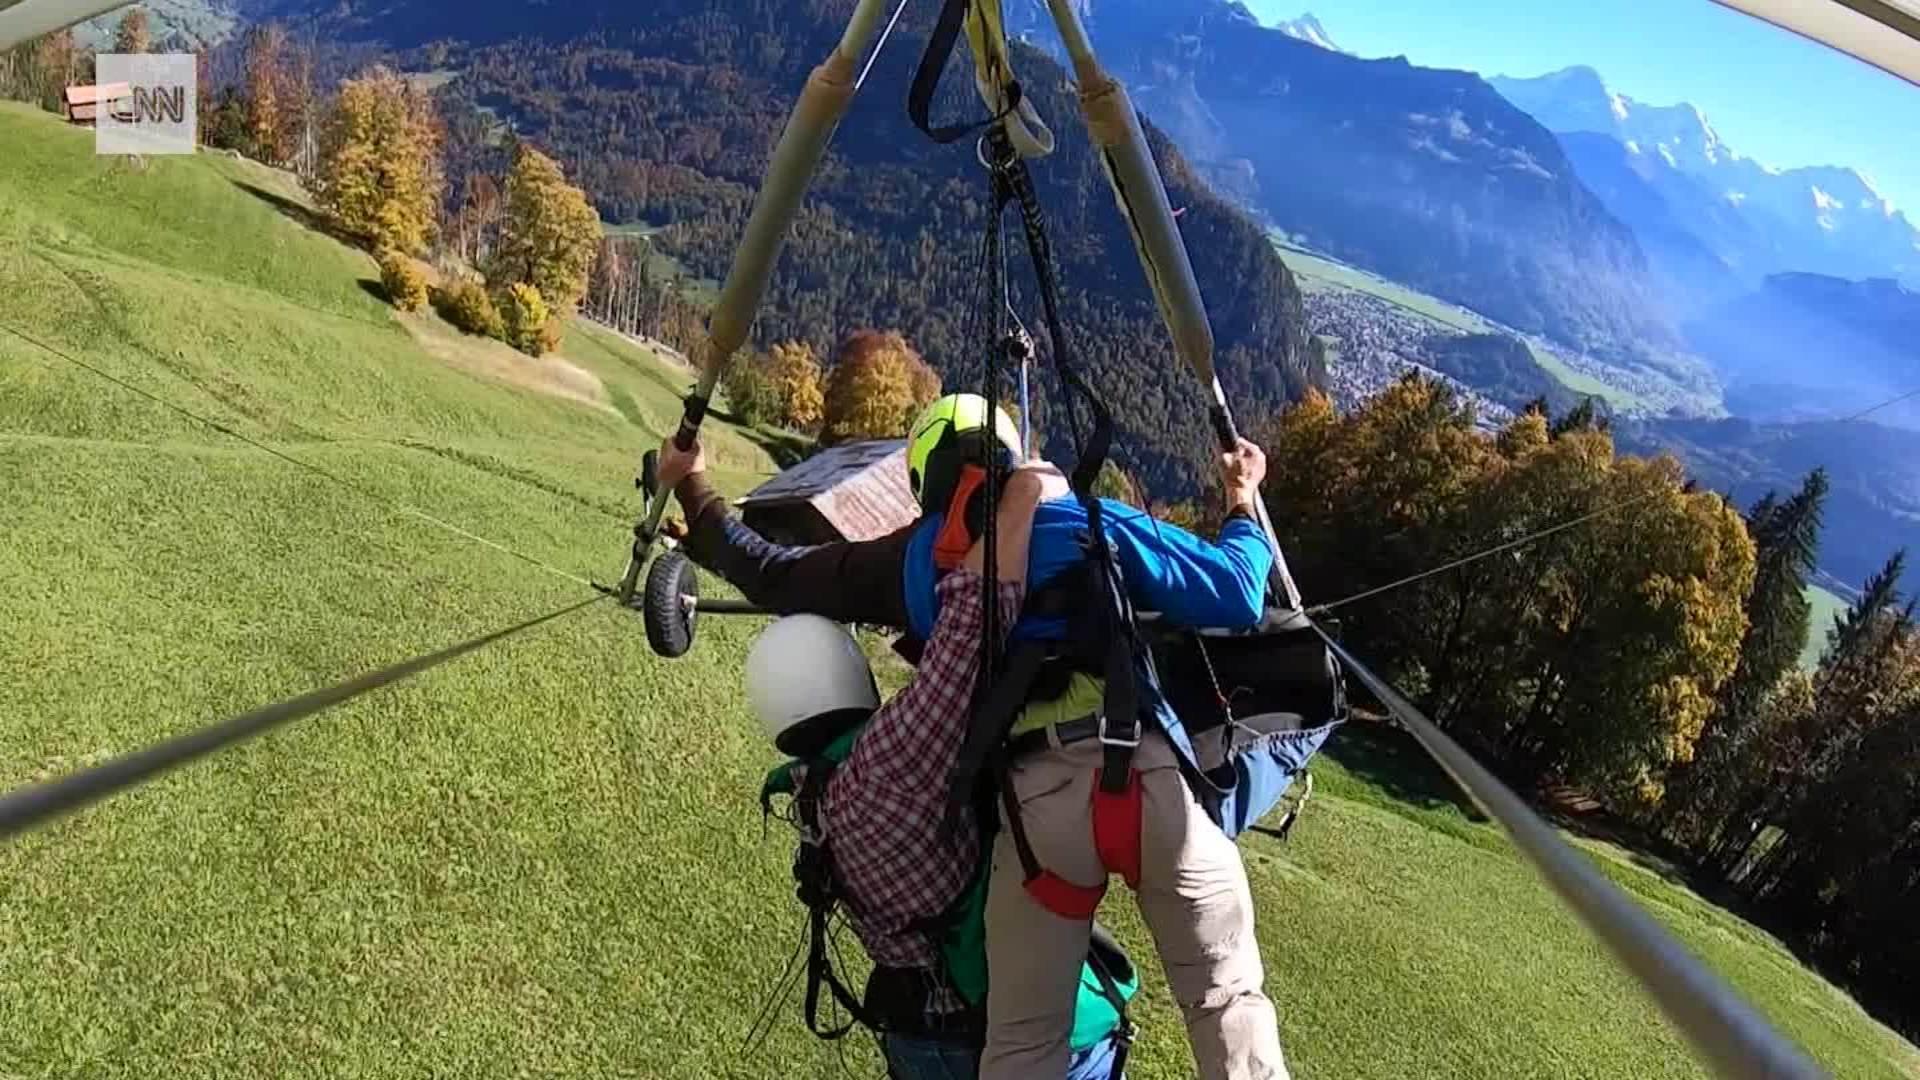 Video shows holiday hang glider flight going horribly wrong